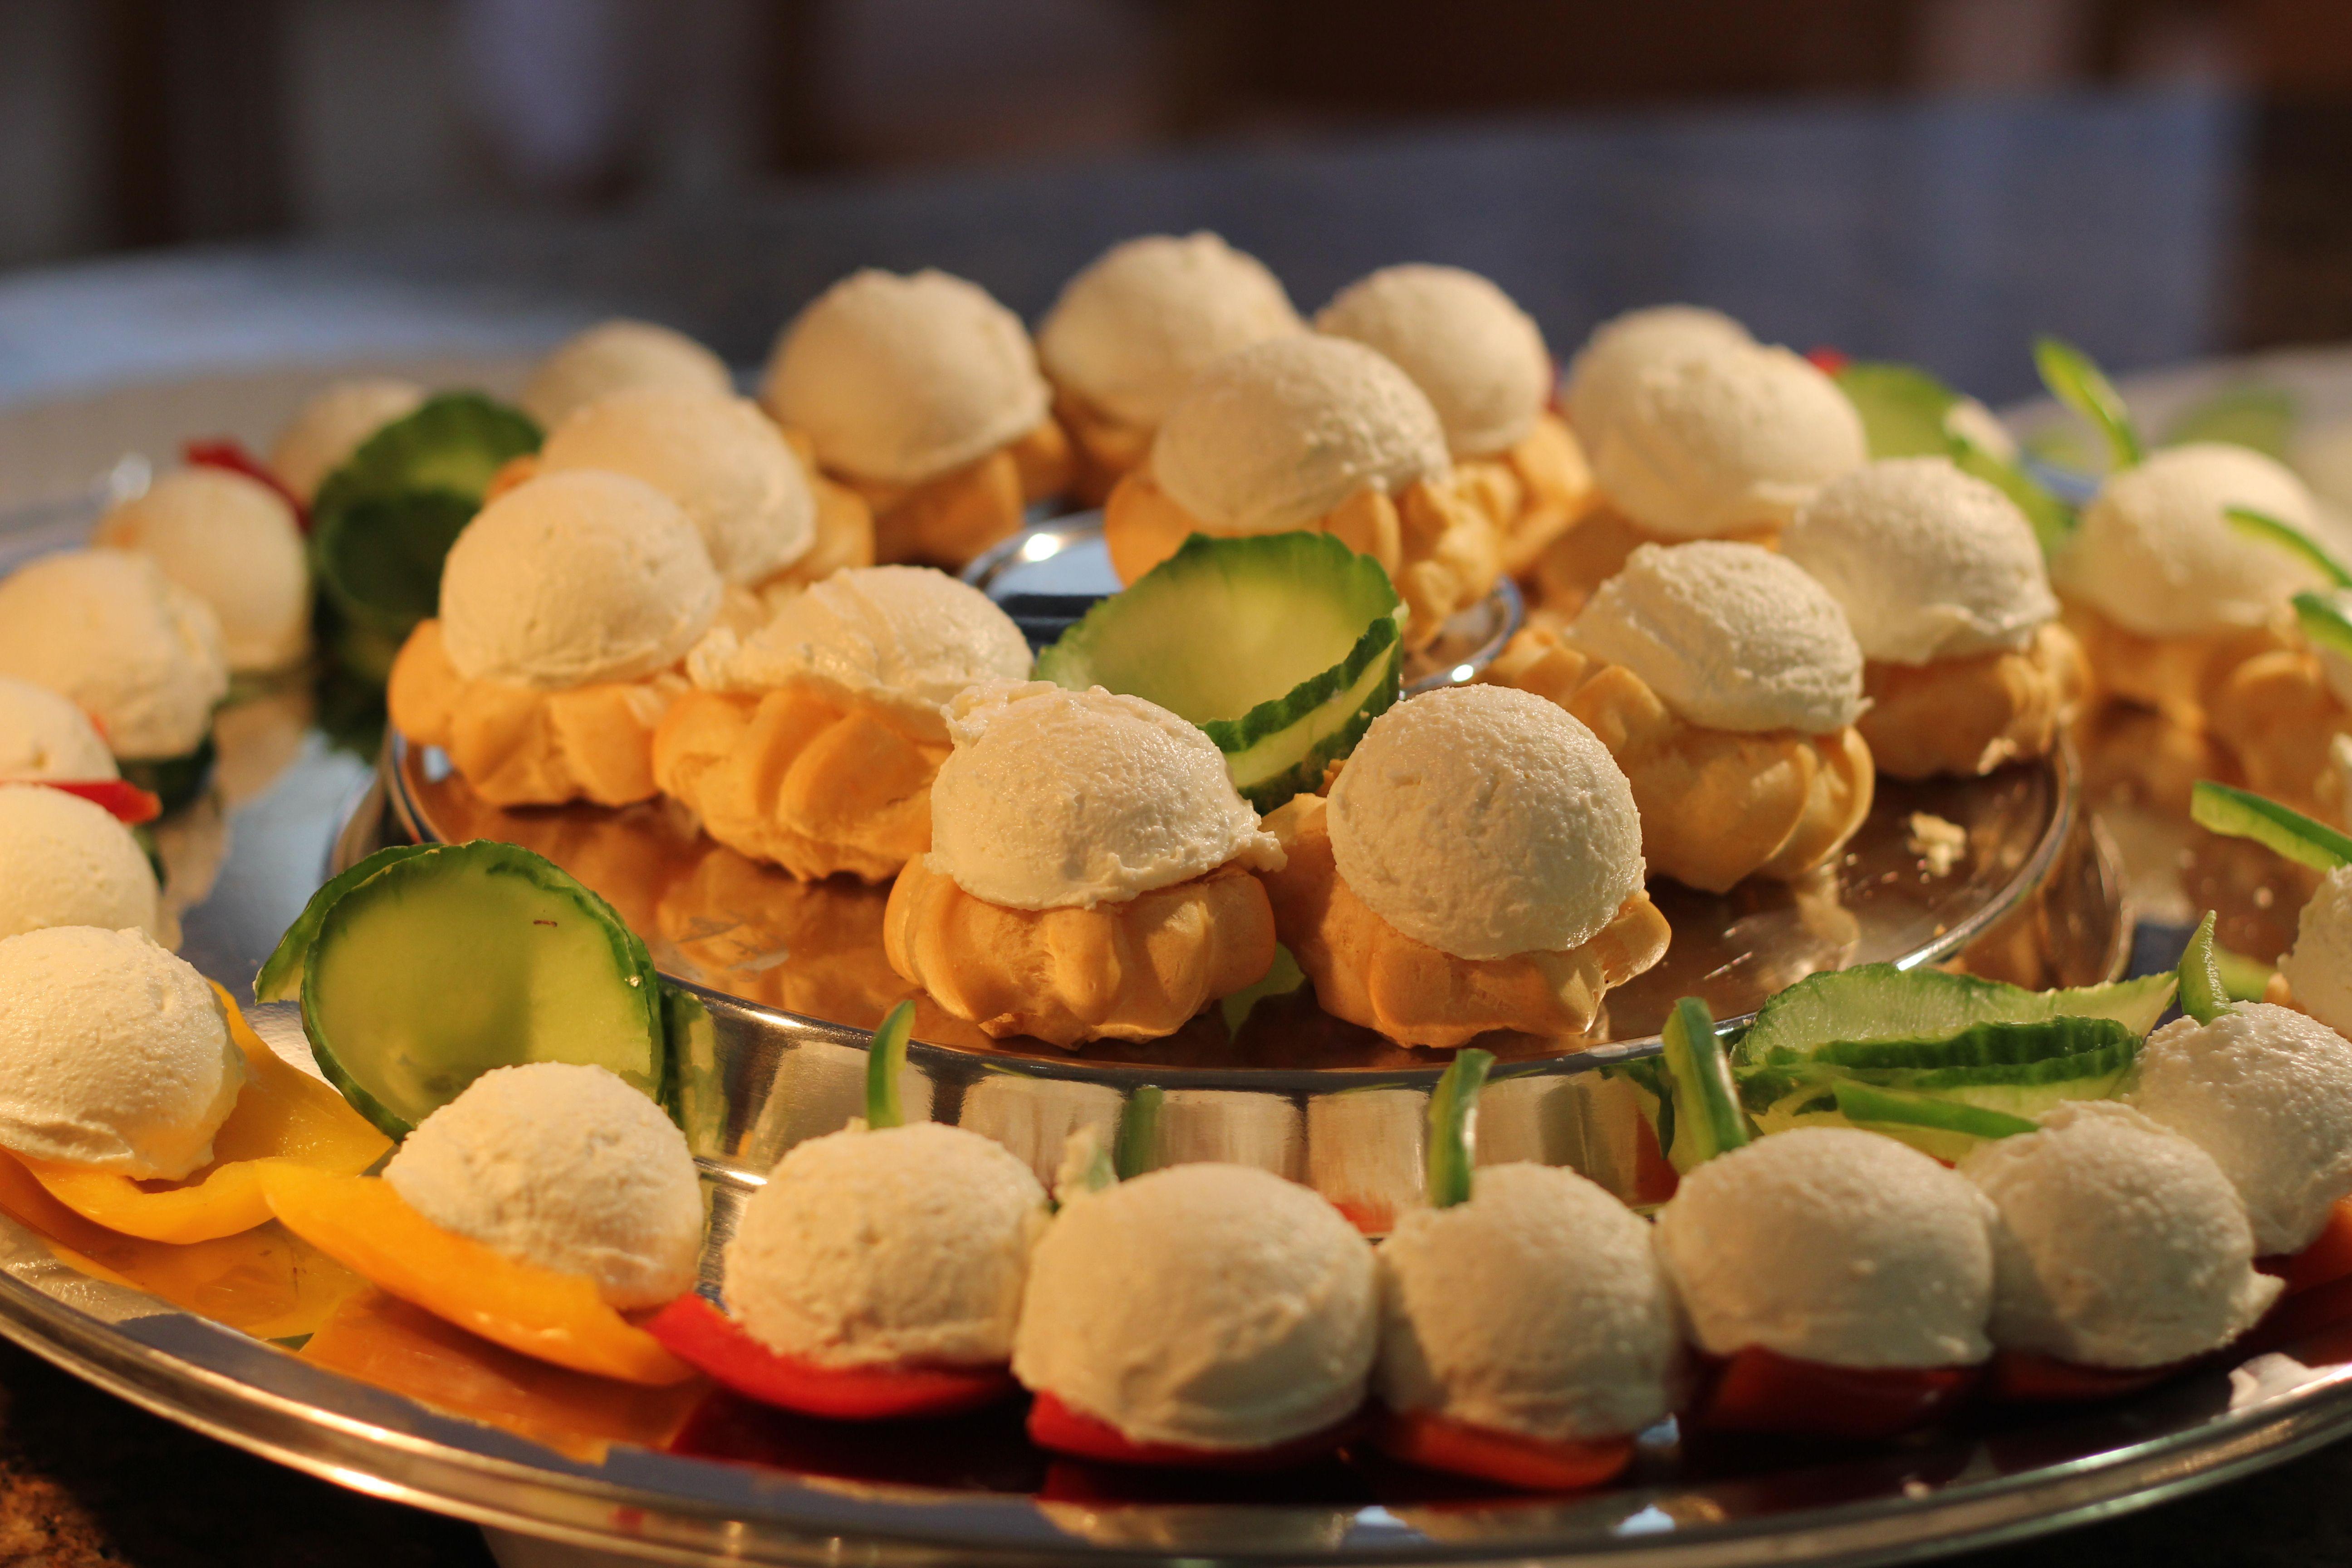 Lekka Kuchnia Food Fruit Cantaloupe